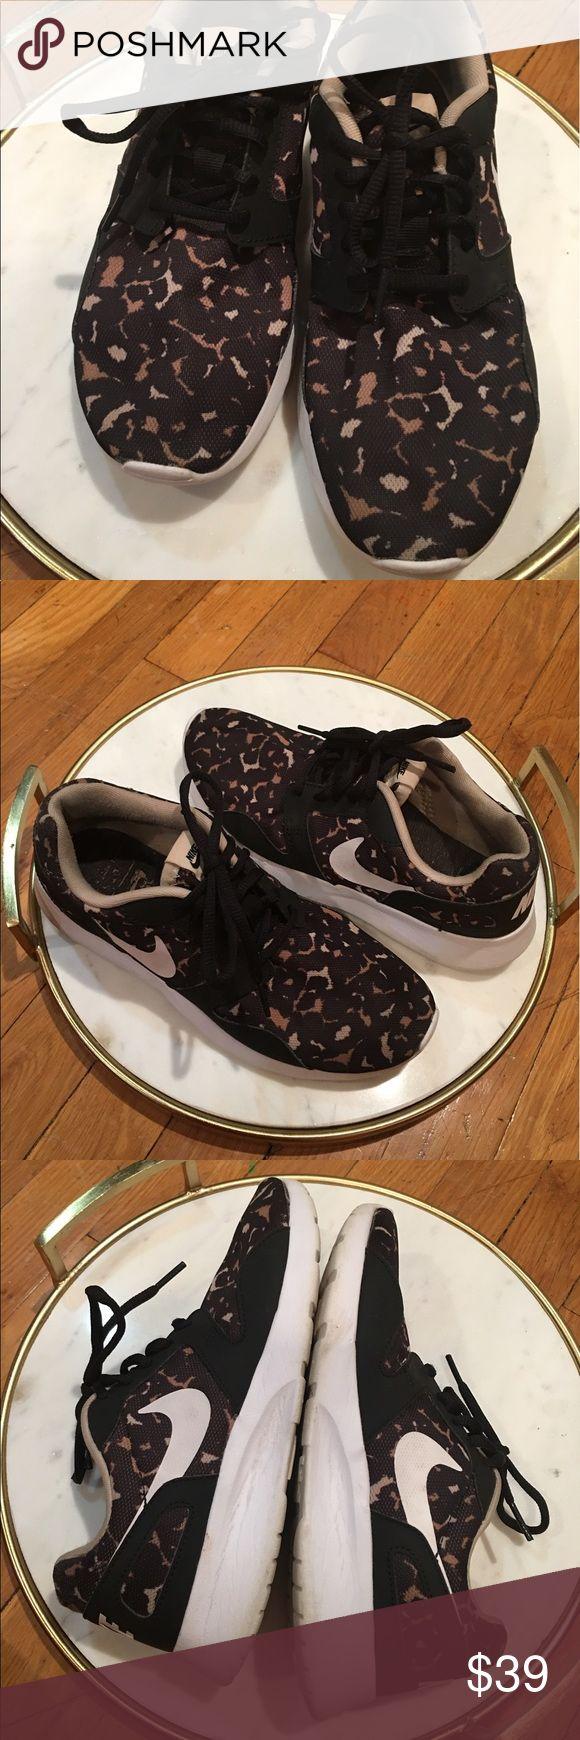 Nike roshe women cheetah sneakers size 6 women Nike roshe women cheetah sneakers size 6 women Nike Shoes Sneakers